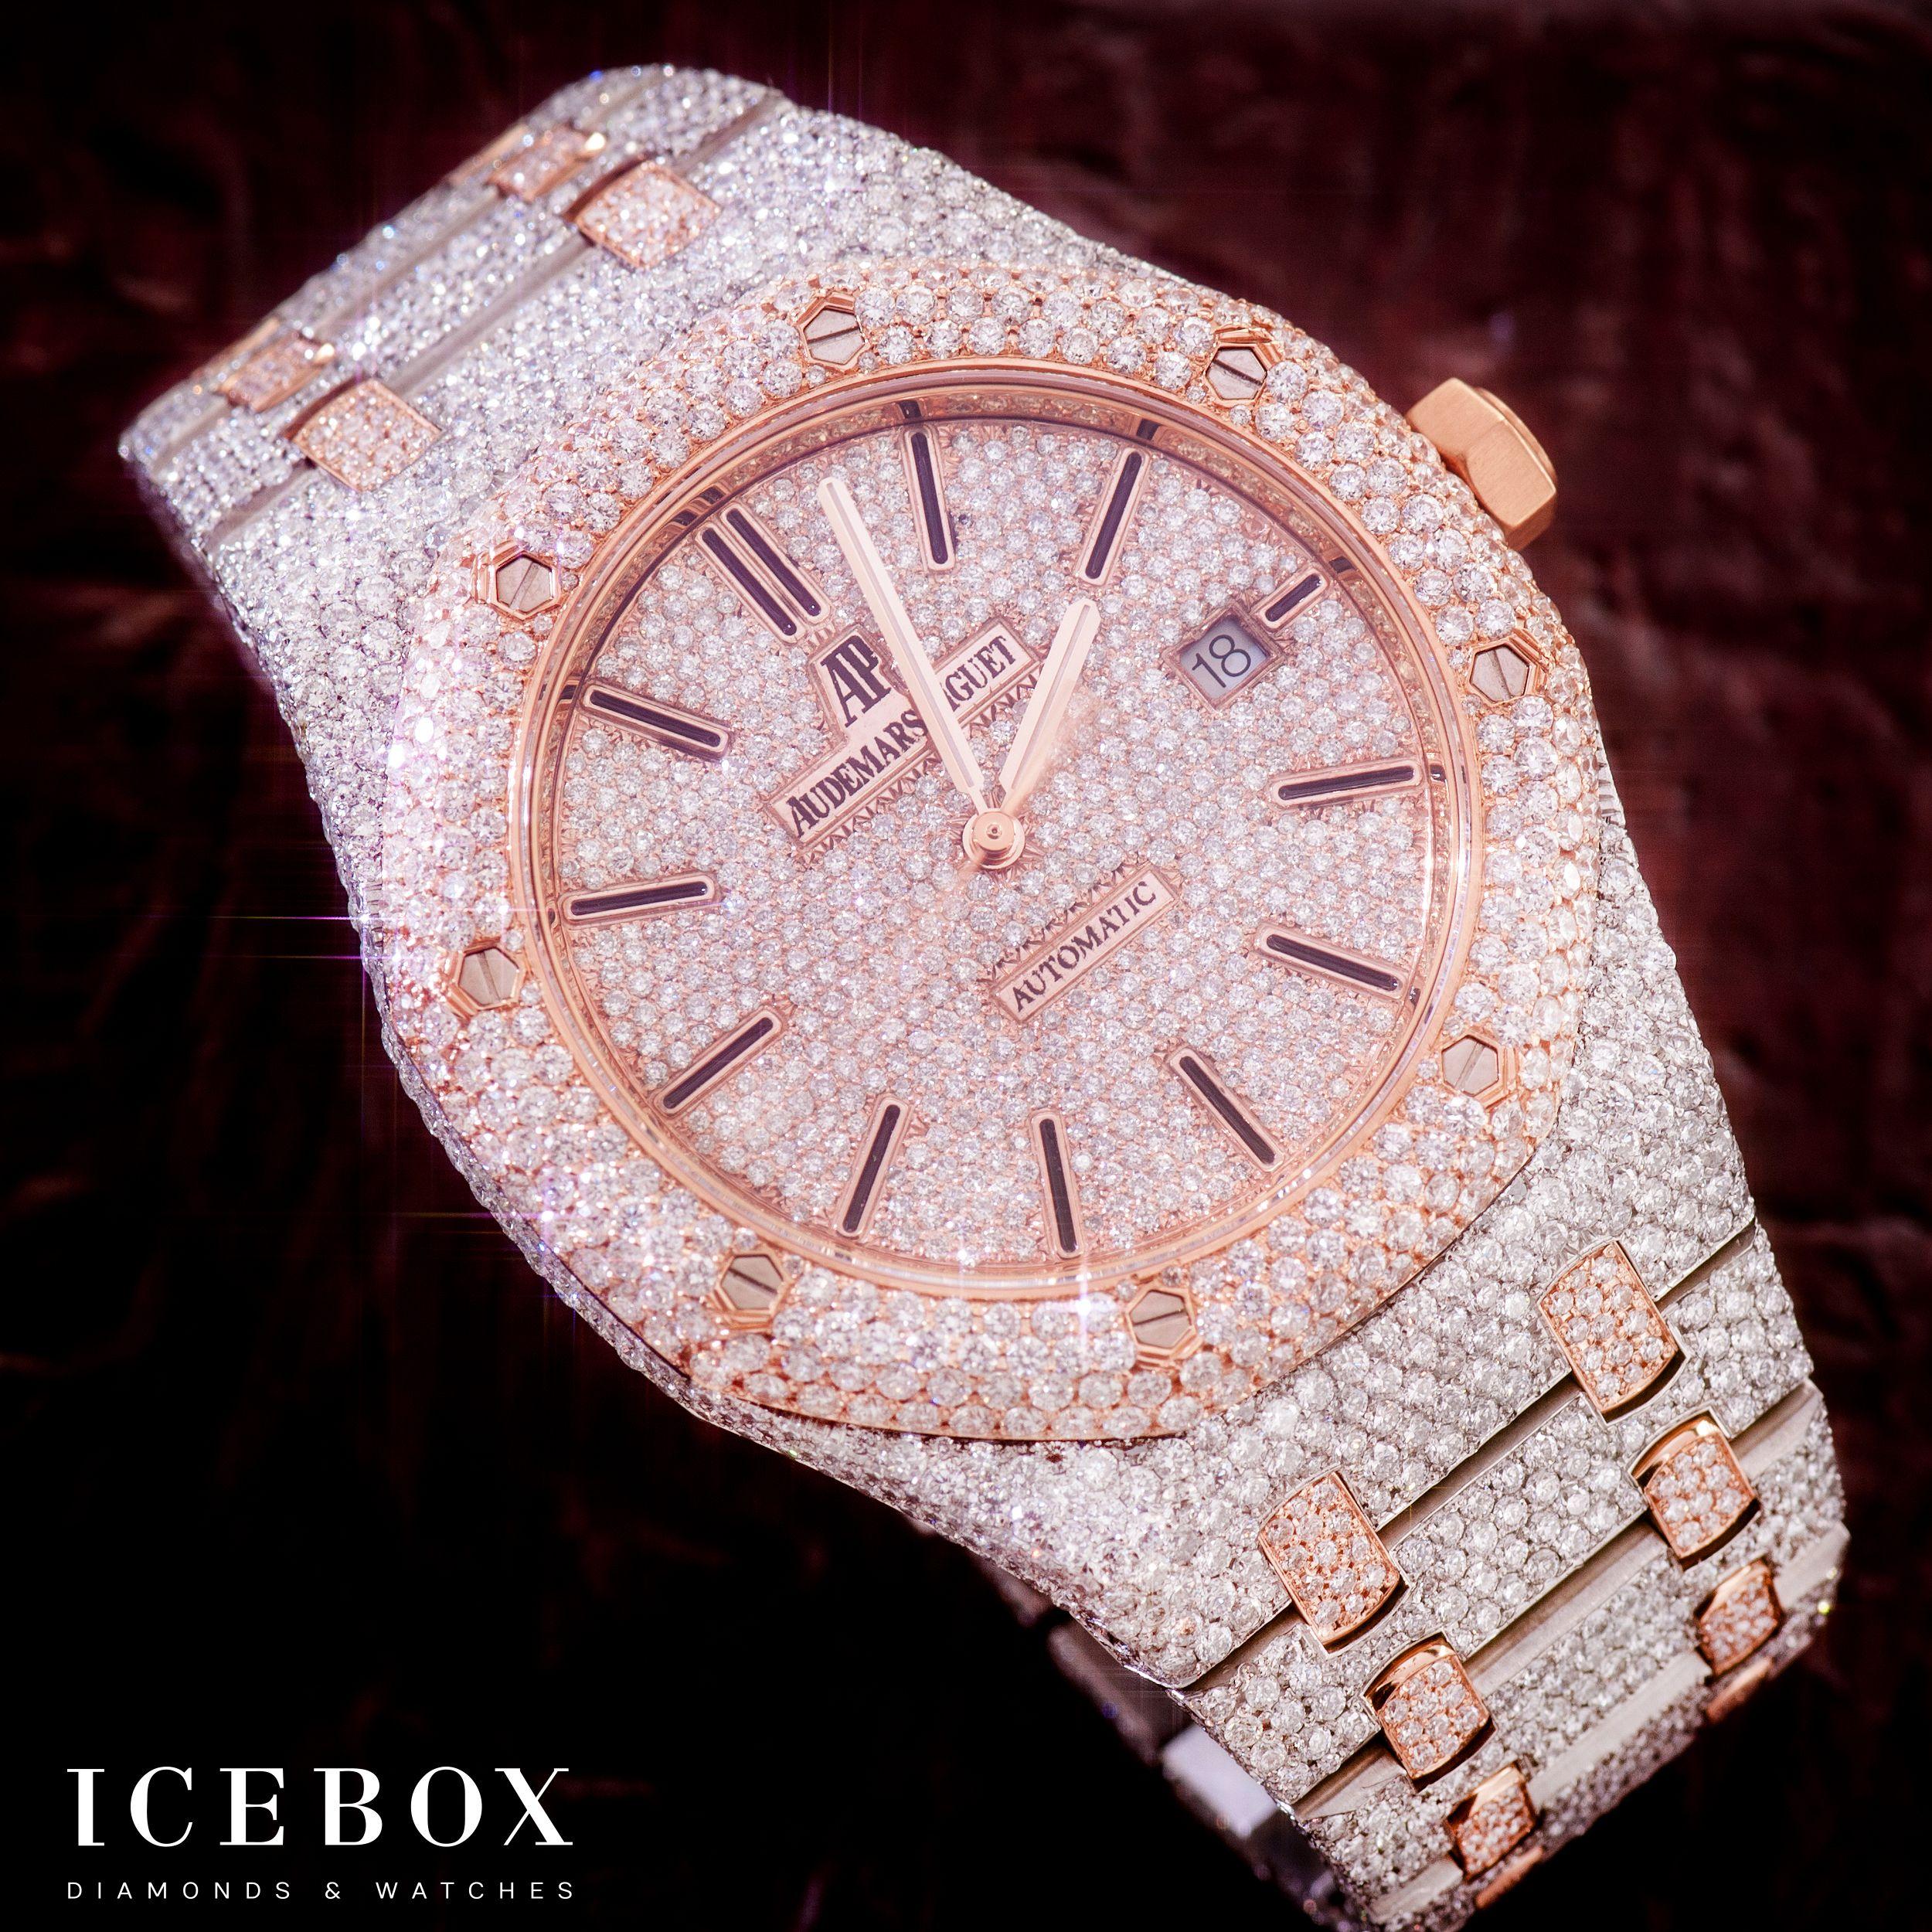 Pin by Icebox Diamonds & Watches on Audemars Piguet | Gold ...